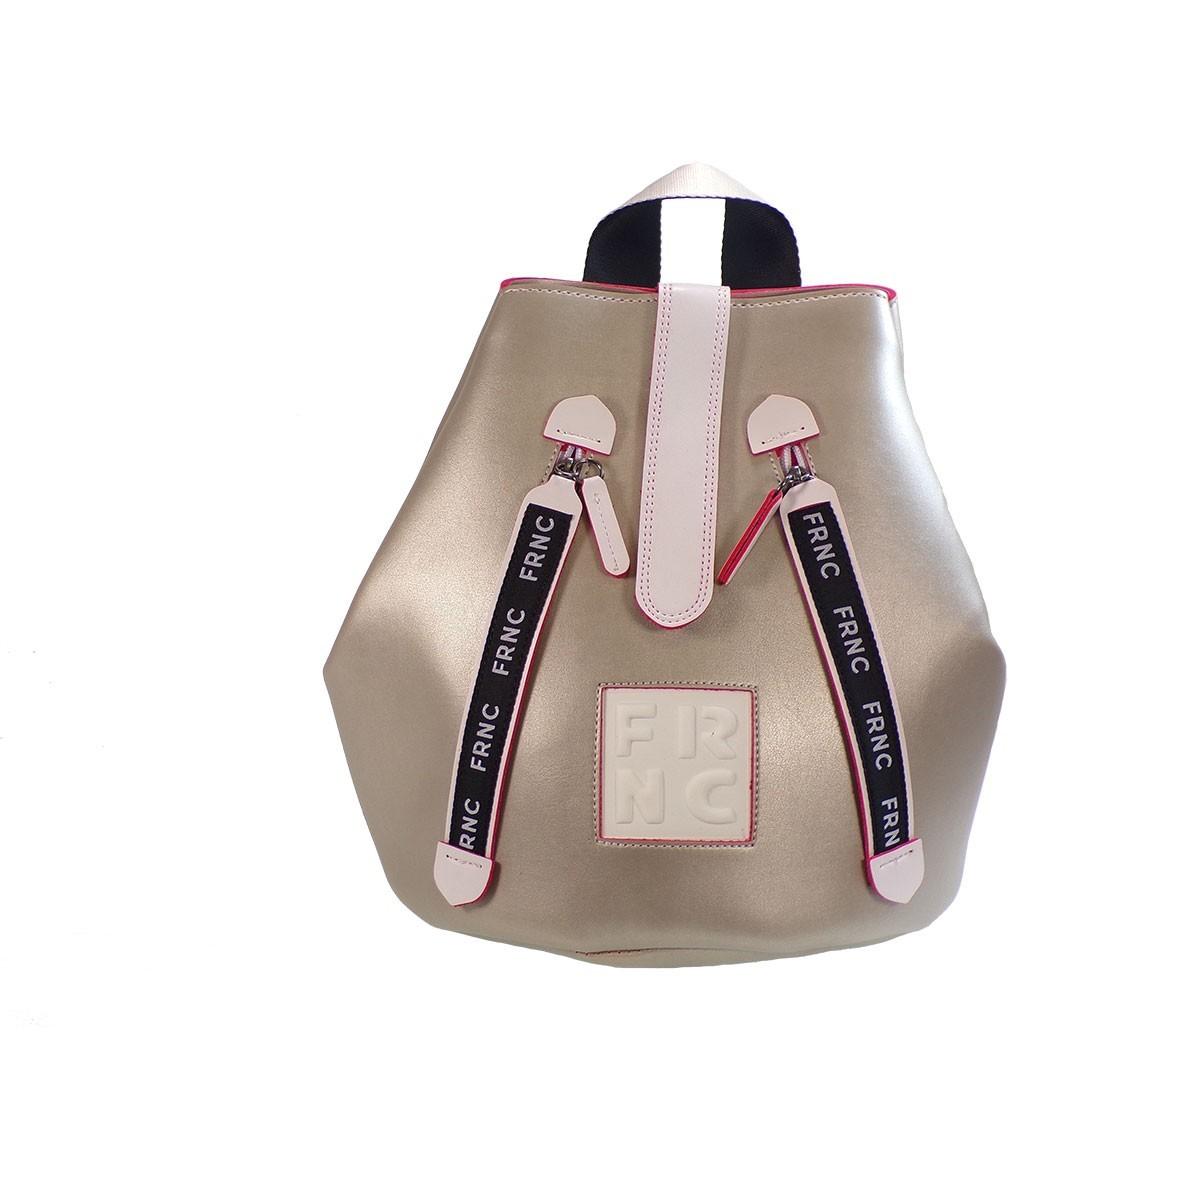 3ab3271d11 FRNC FRANCESCO Τσάντα Γυναικεία Πλάτης-Backpack 1240 Πλατίνα Δέρμα ...